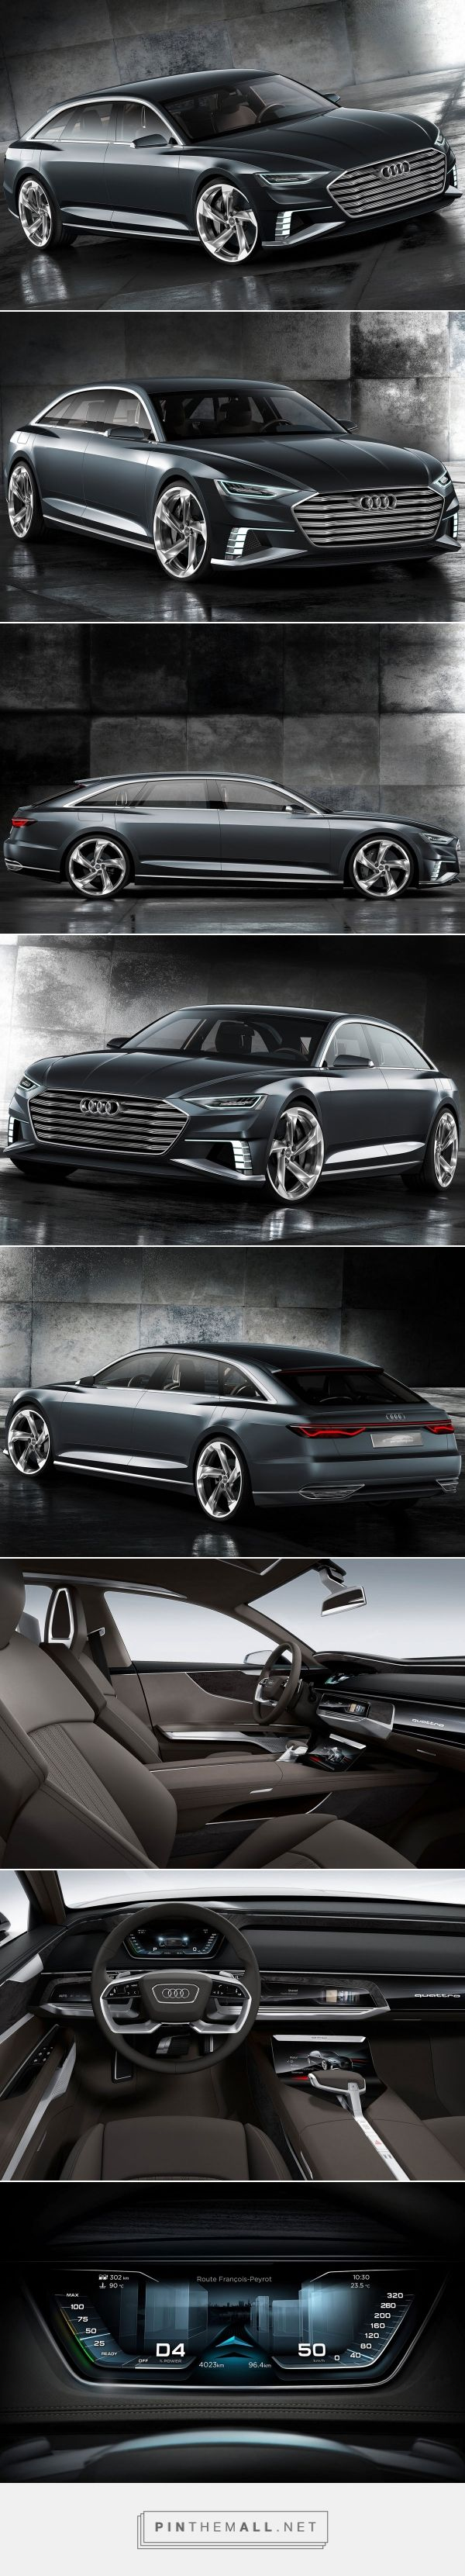 Audi A9 Avant Concept - created via http://pinthemall.net